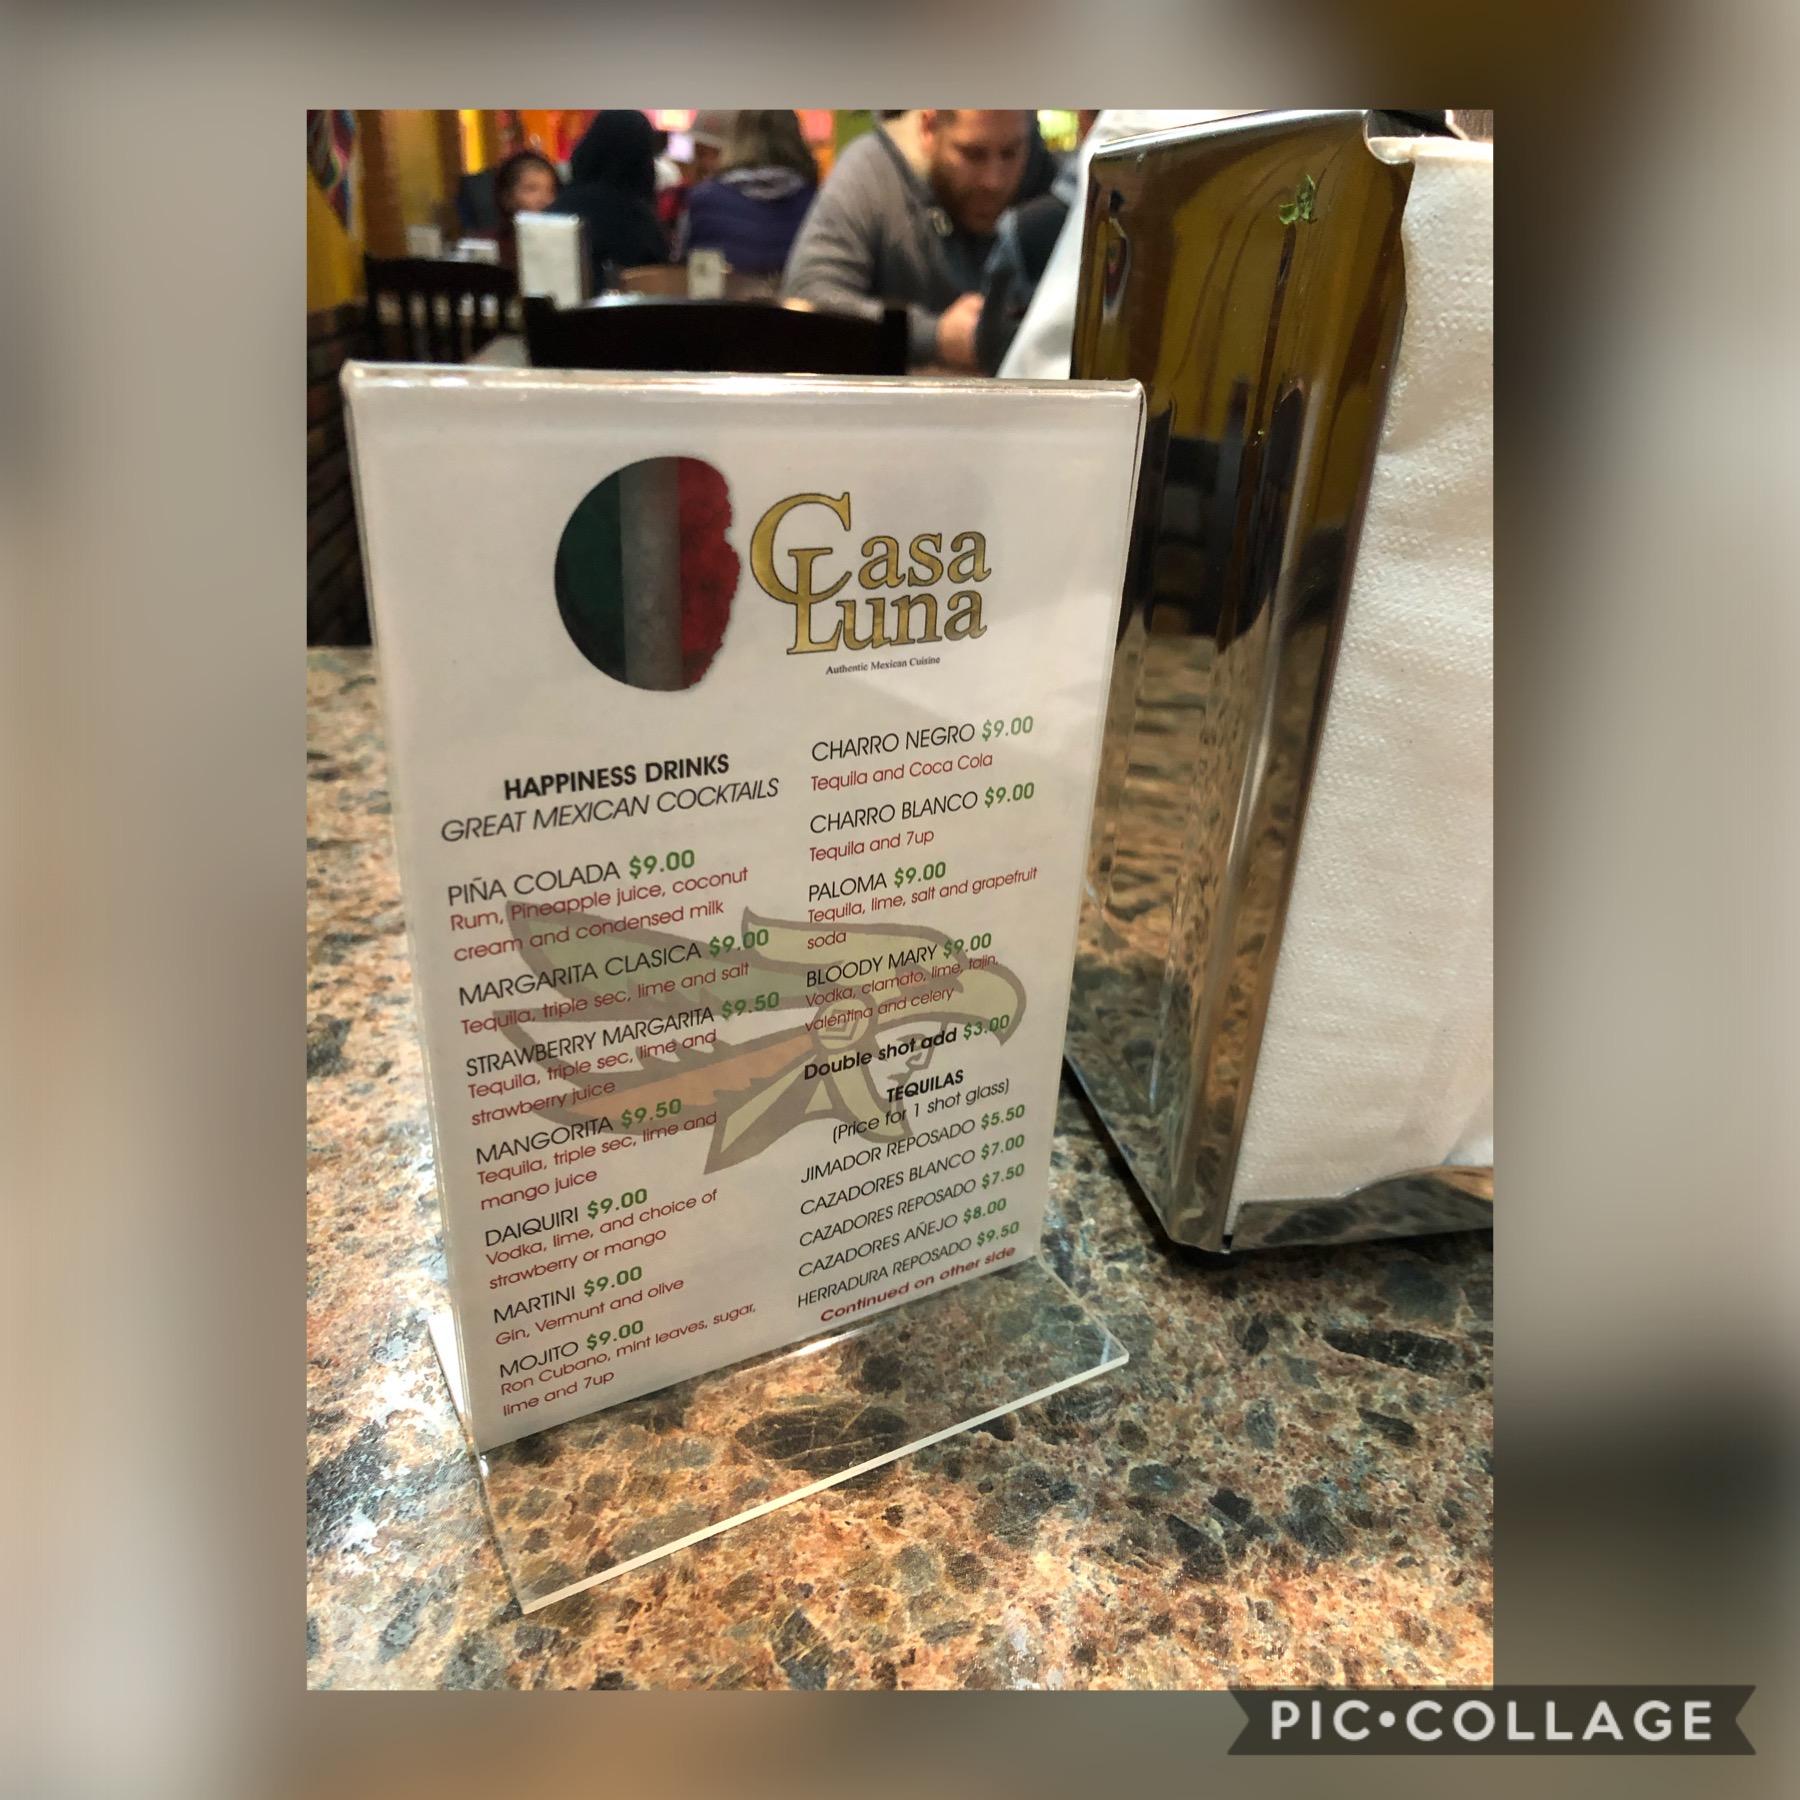 casa luna drink menu.JPG